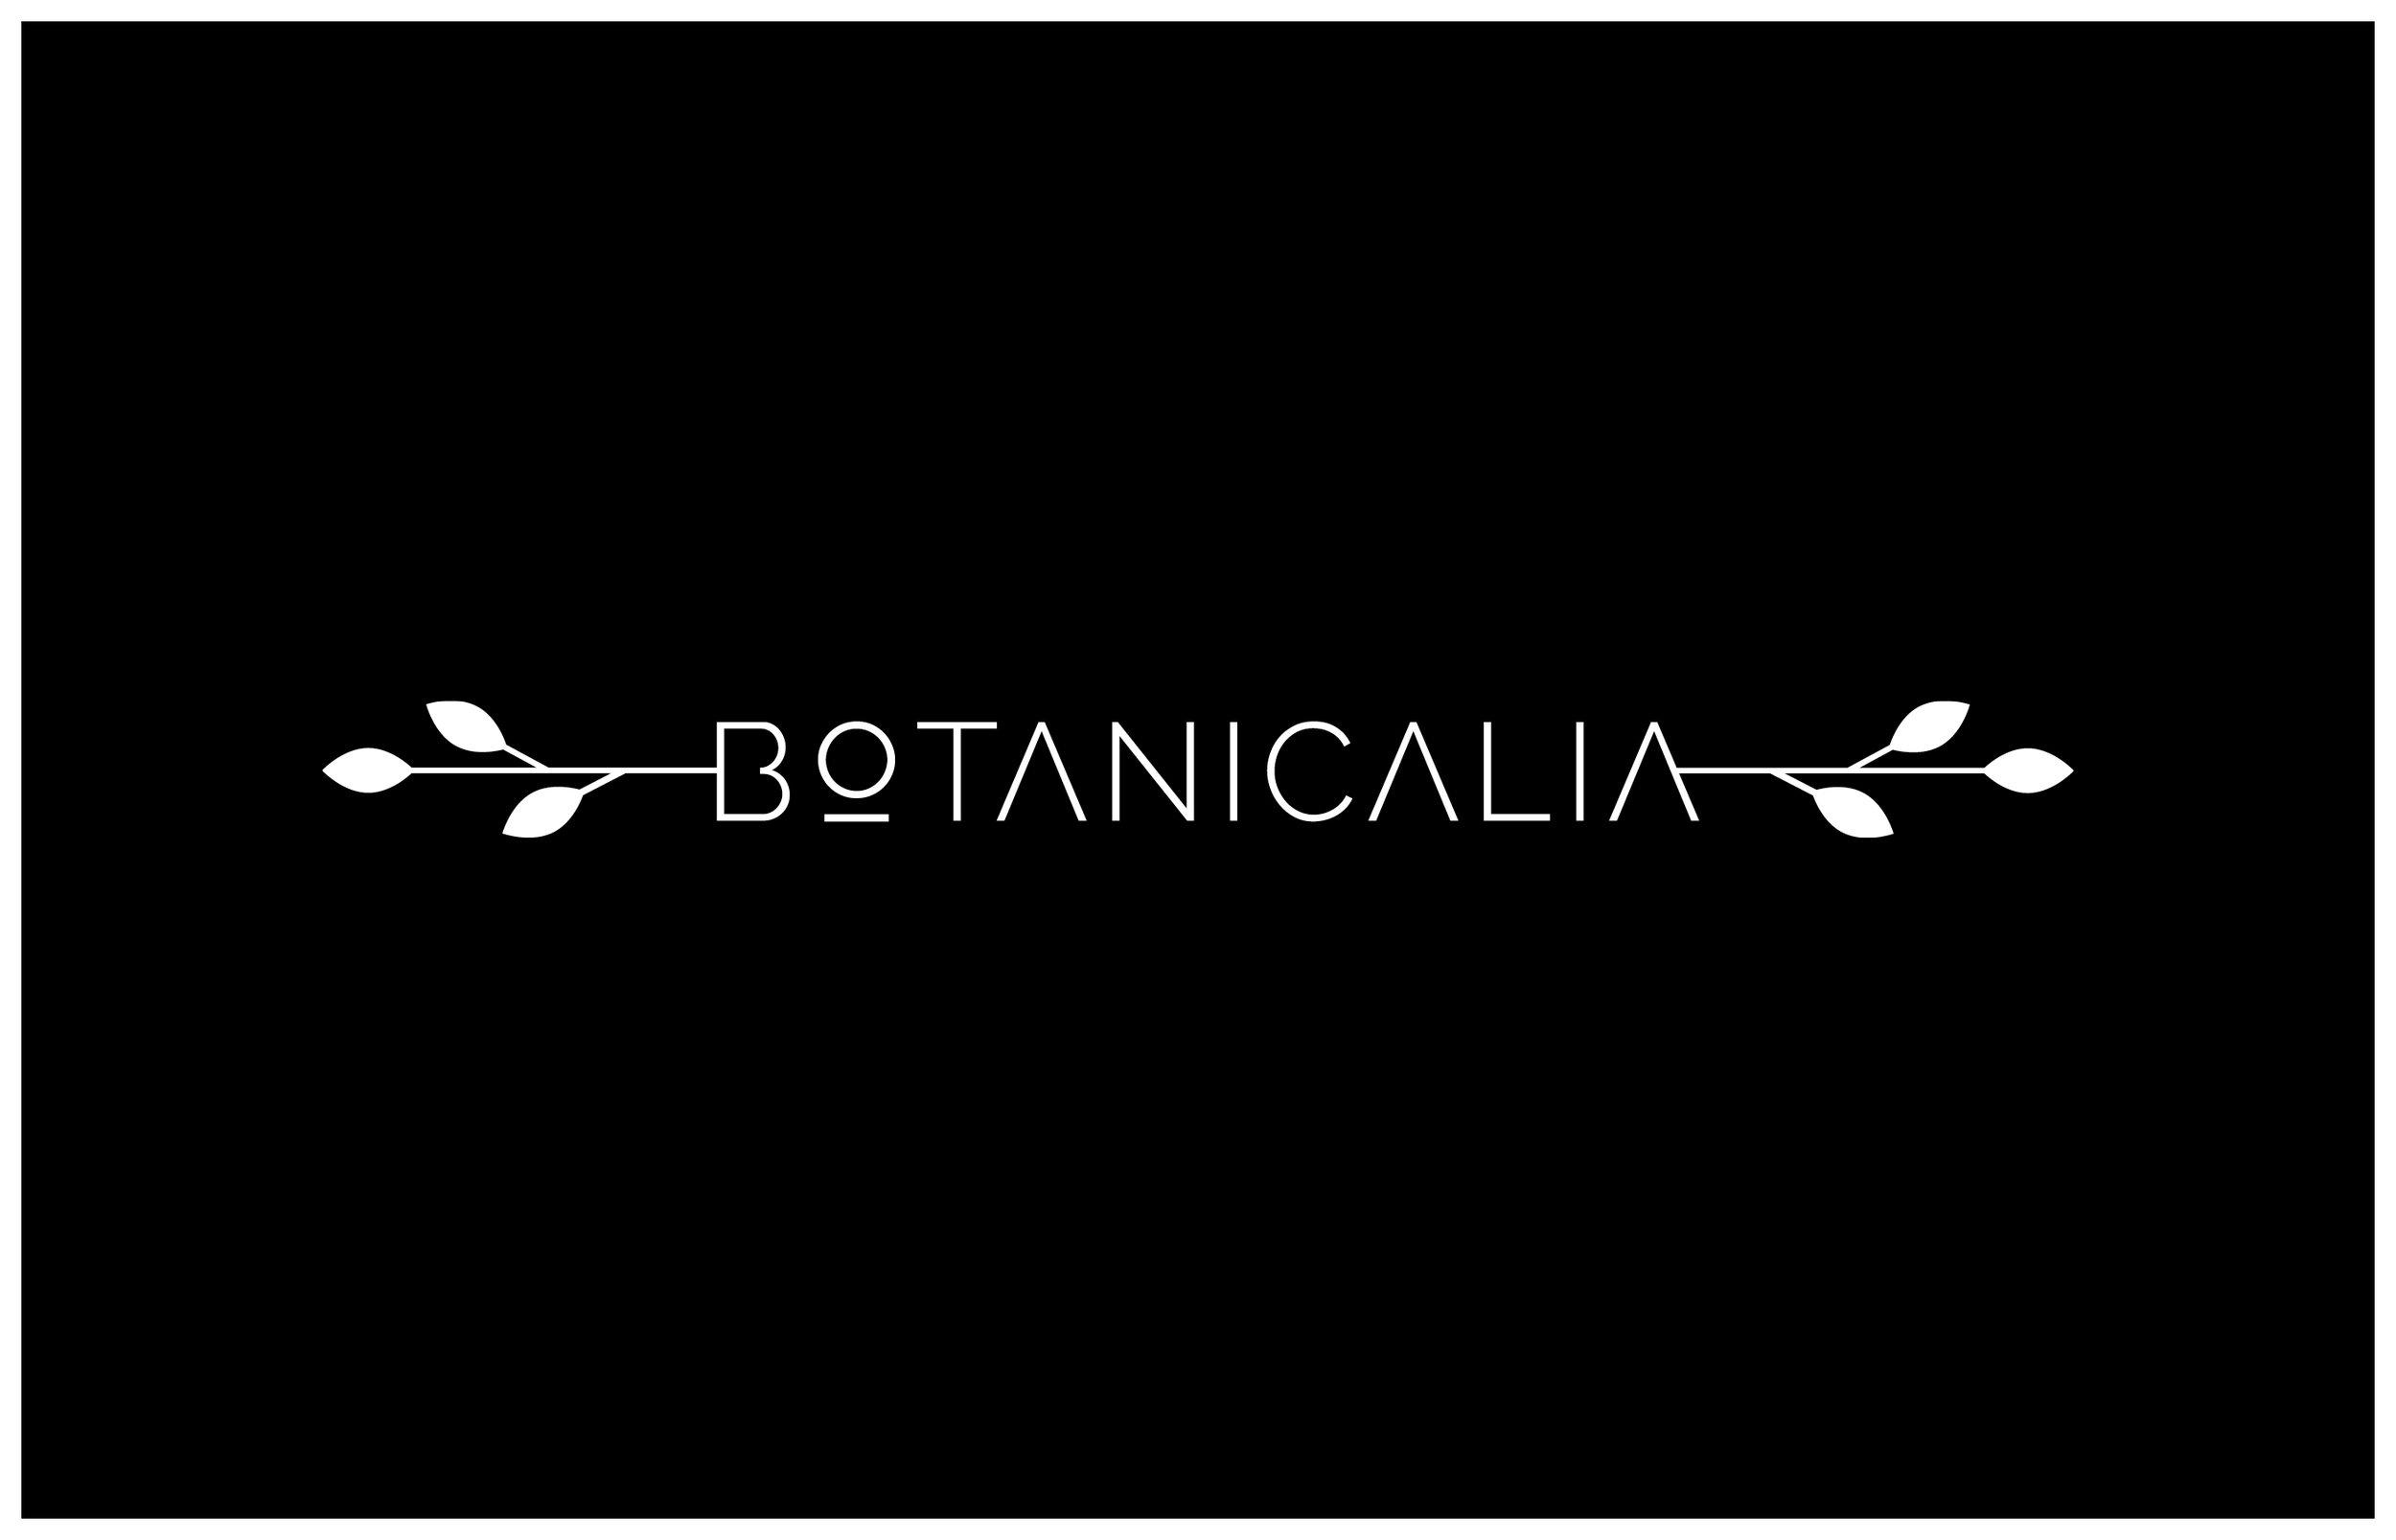 Botanicalia Branding